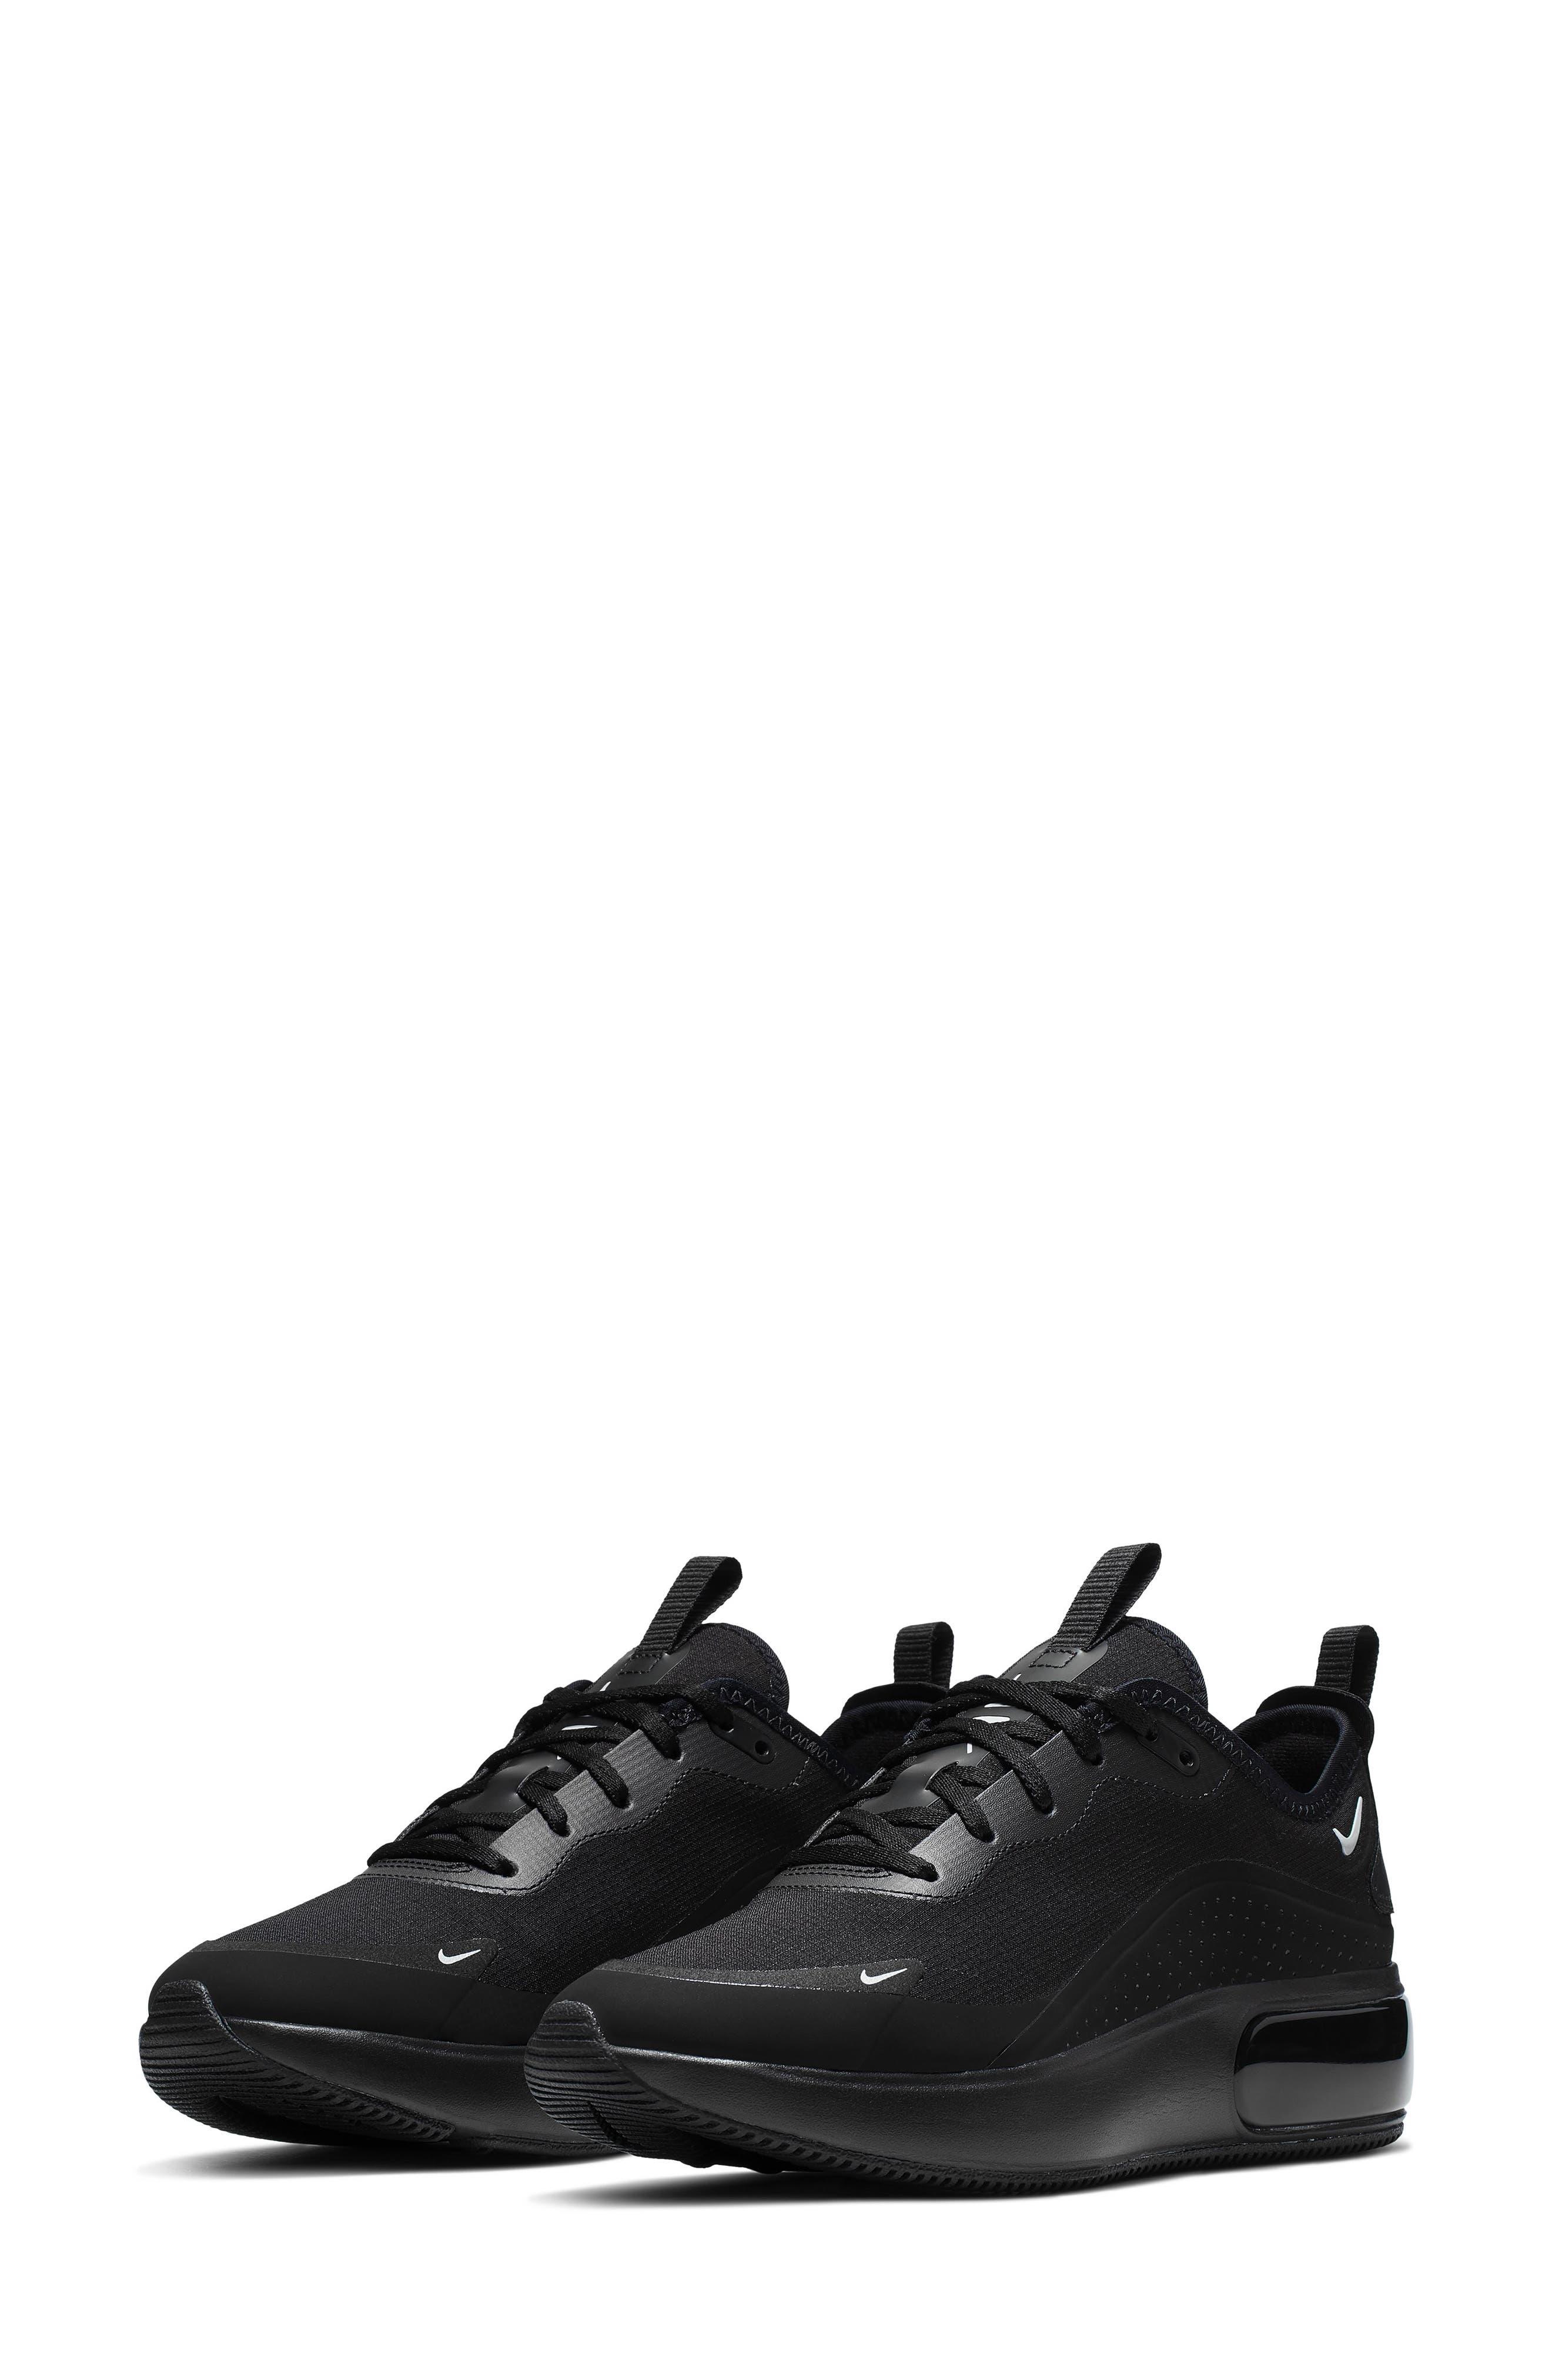 Women's Nordstrom x Nike Sneakers | Nordstrom